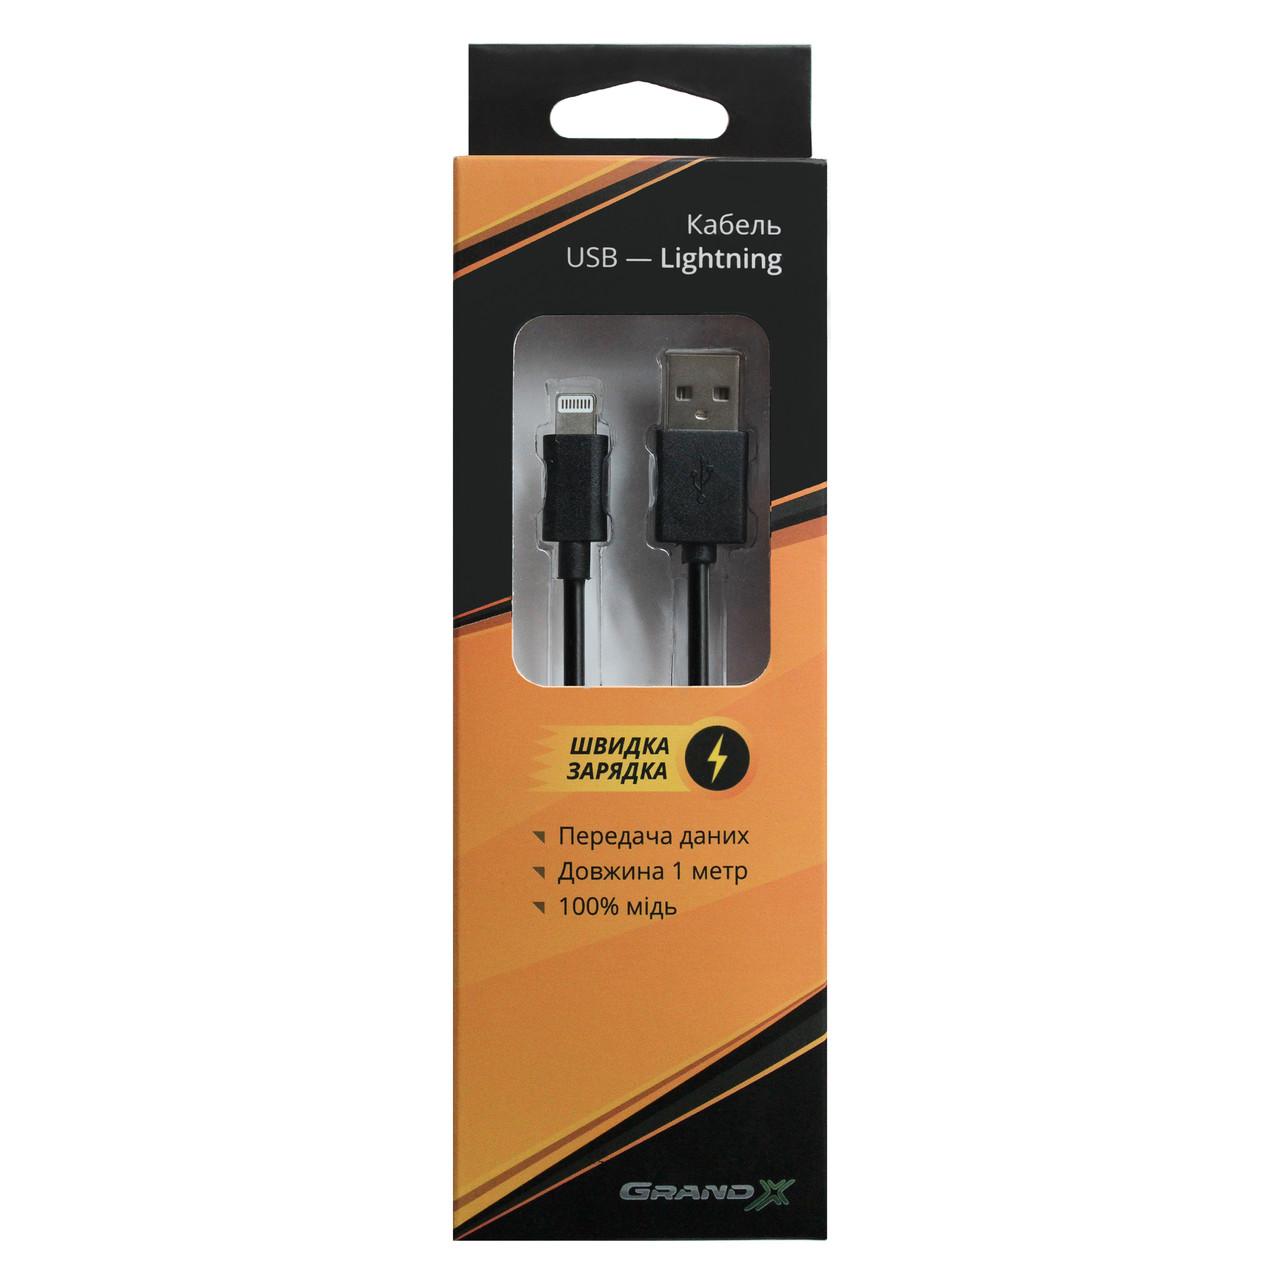 Кабель Grand-X USB Lightning PL01B Black